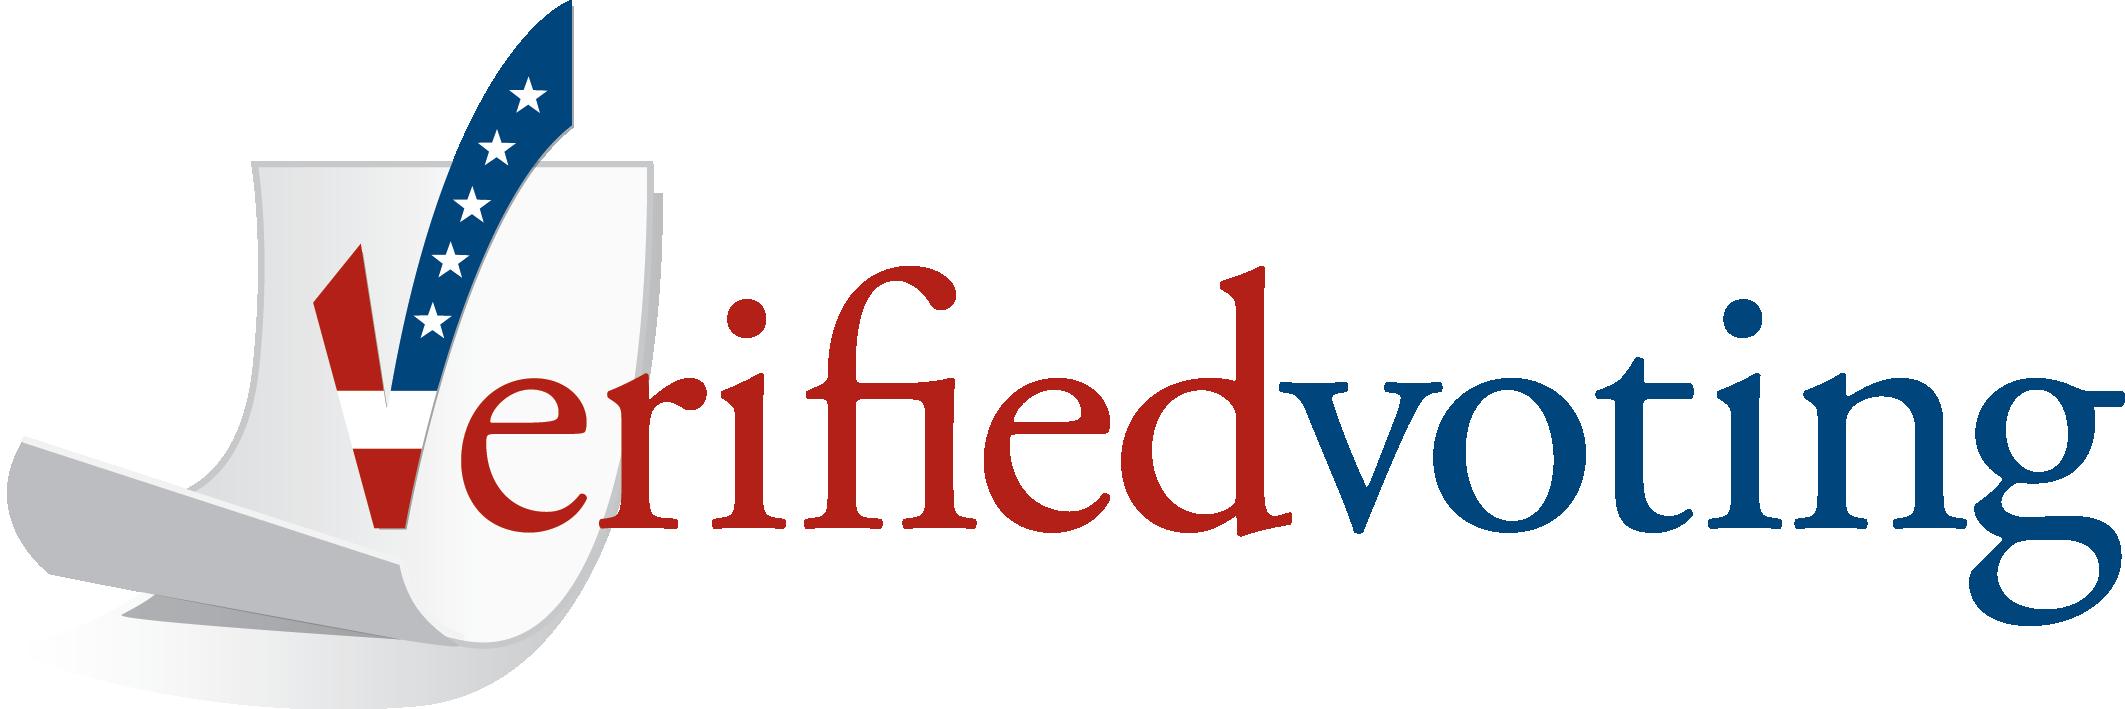 VerifiedVoting_Logo_VVonly.png